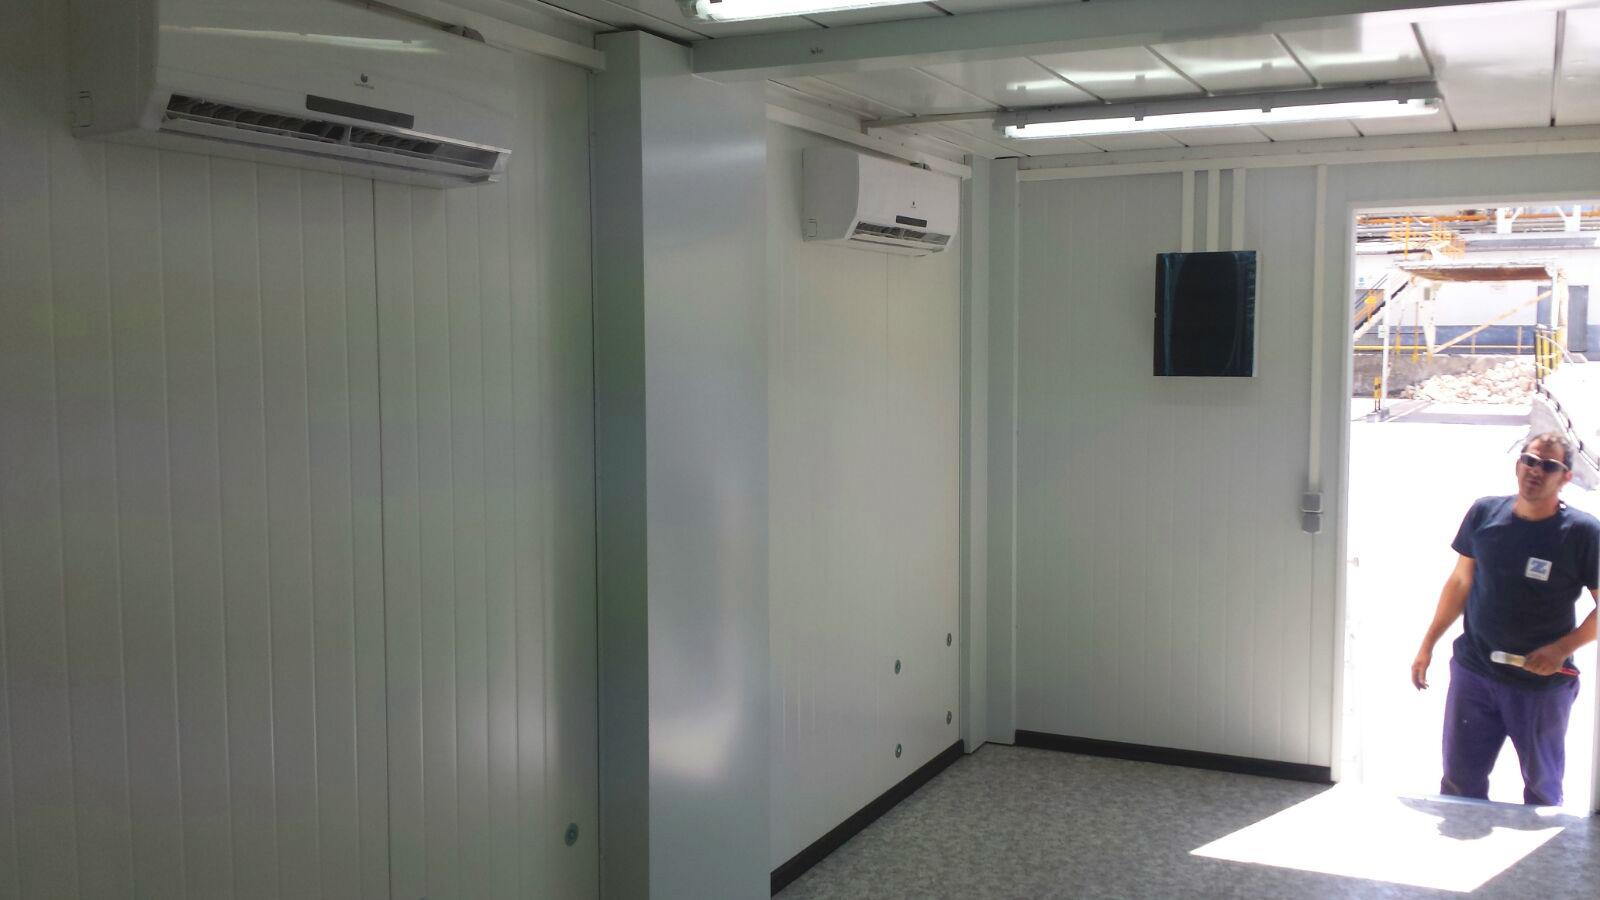 Conjunto Modular - Detalle A/A y cuadro eléctrico